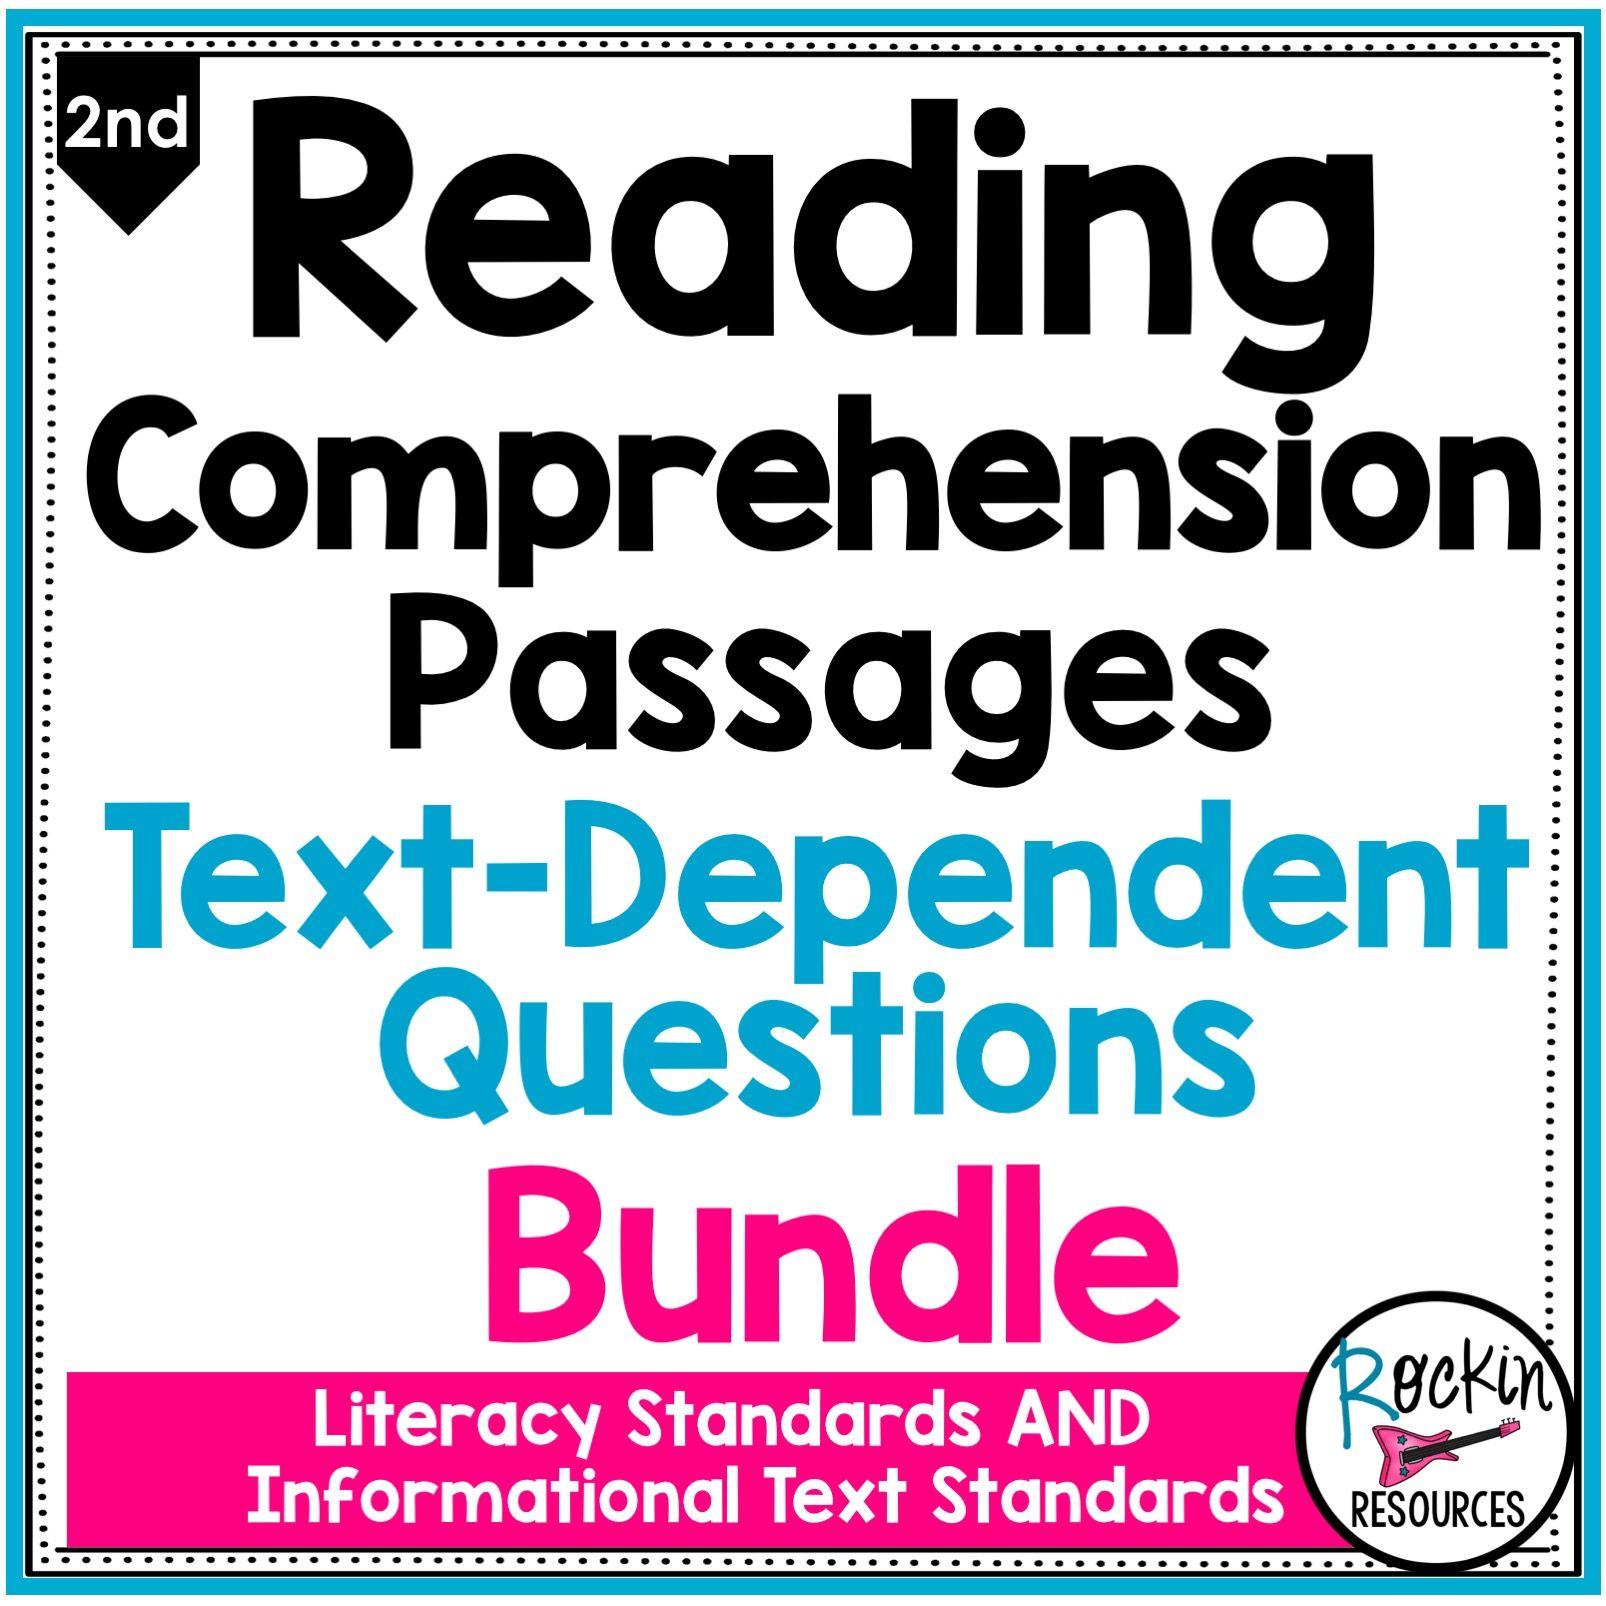 2nd Grade Reading Comprehension Passages Bundle